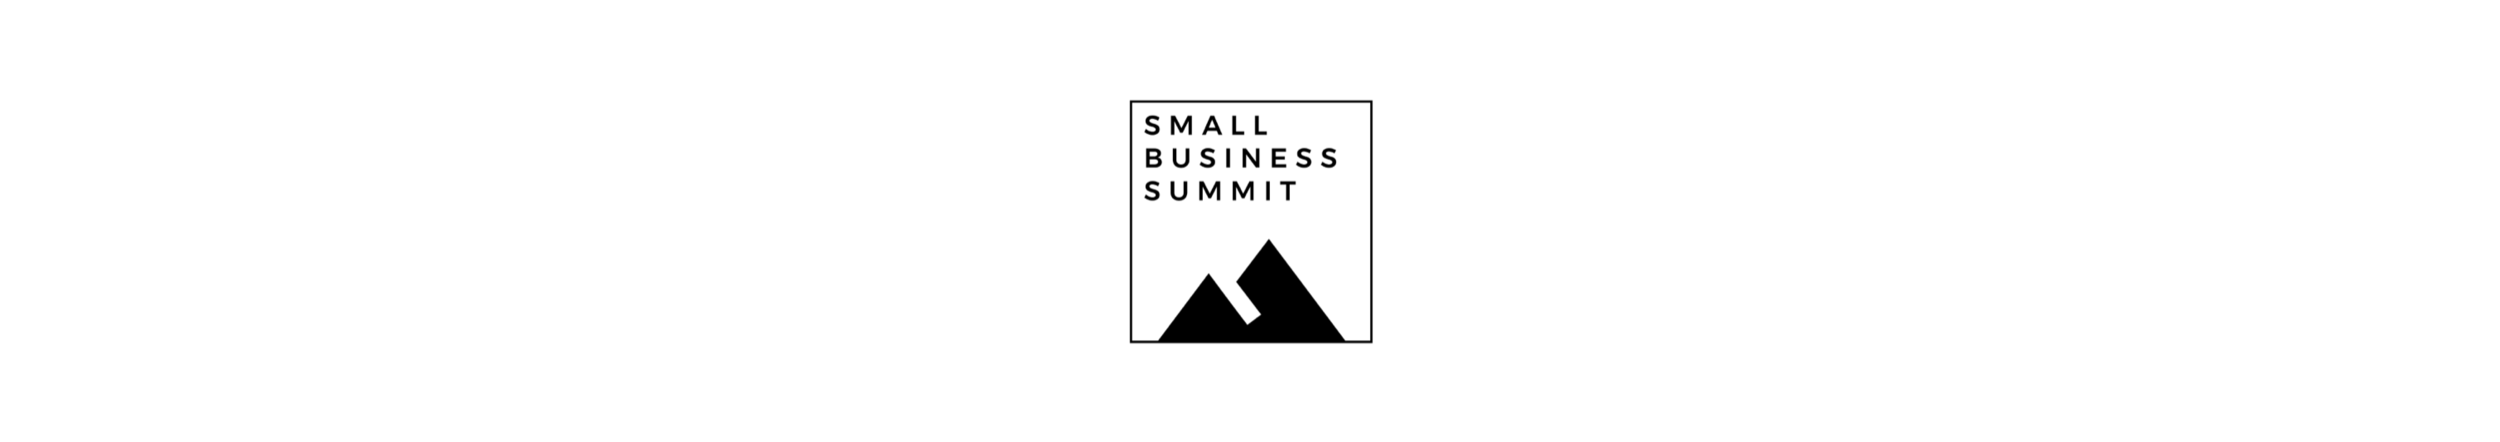 business-mountain-logo.png